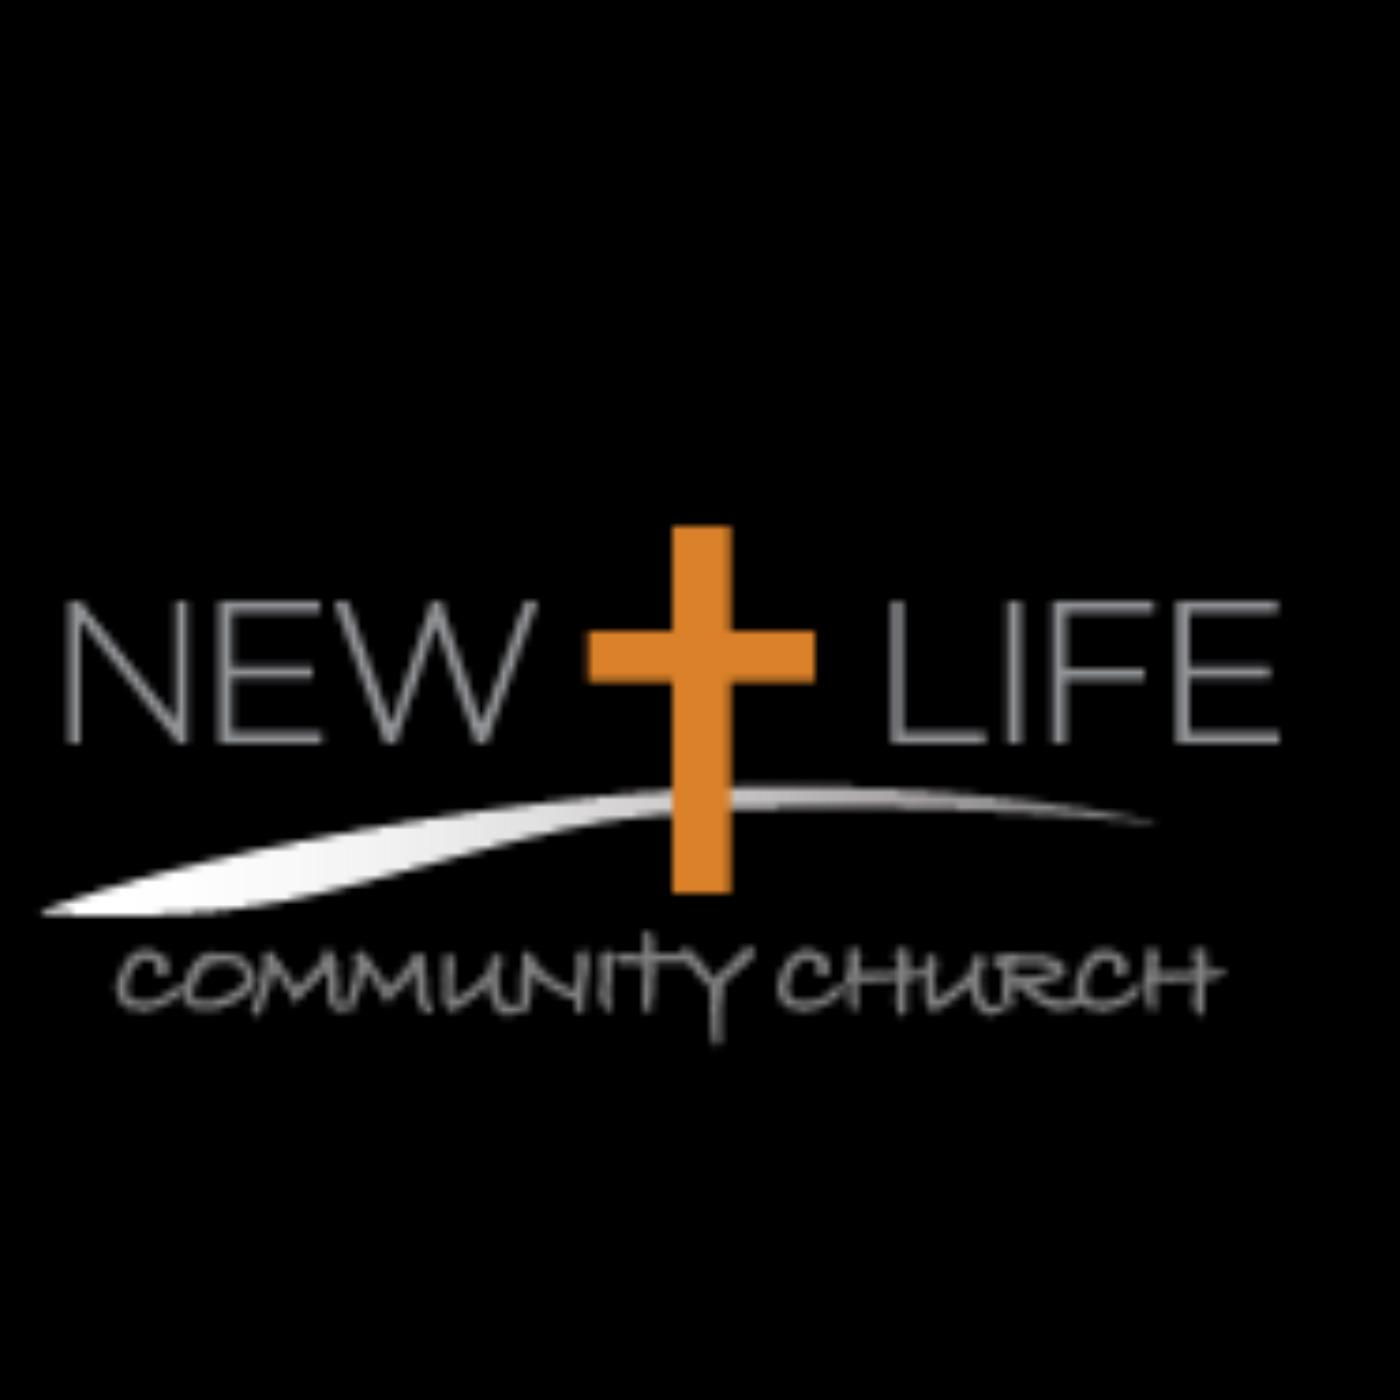 New Life Community Church Wayland